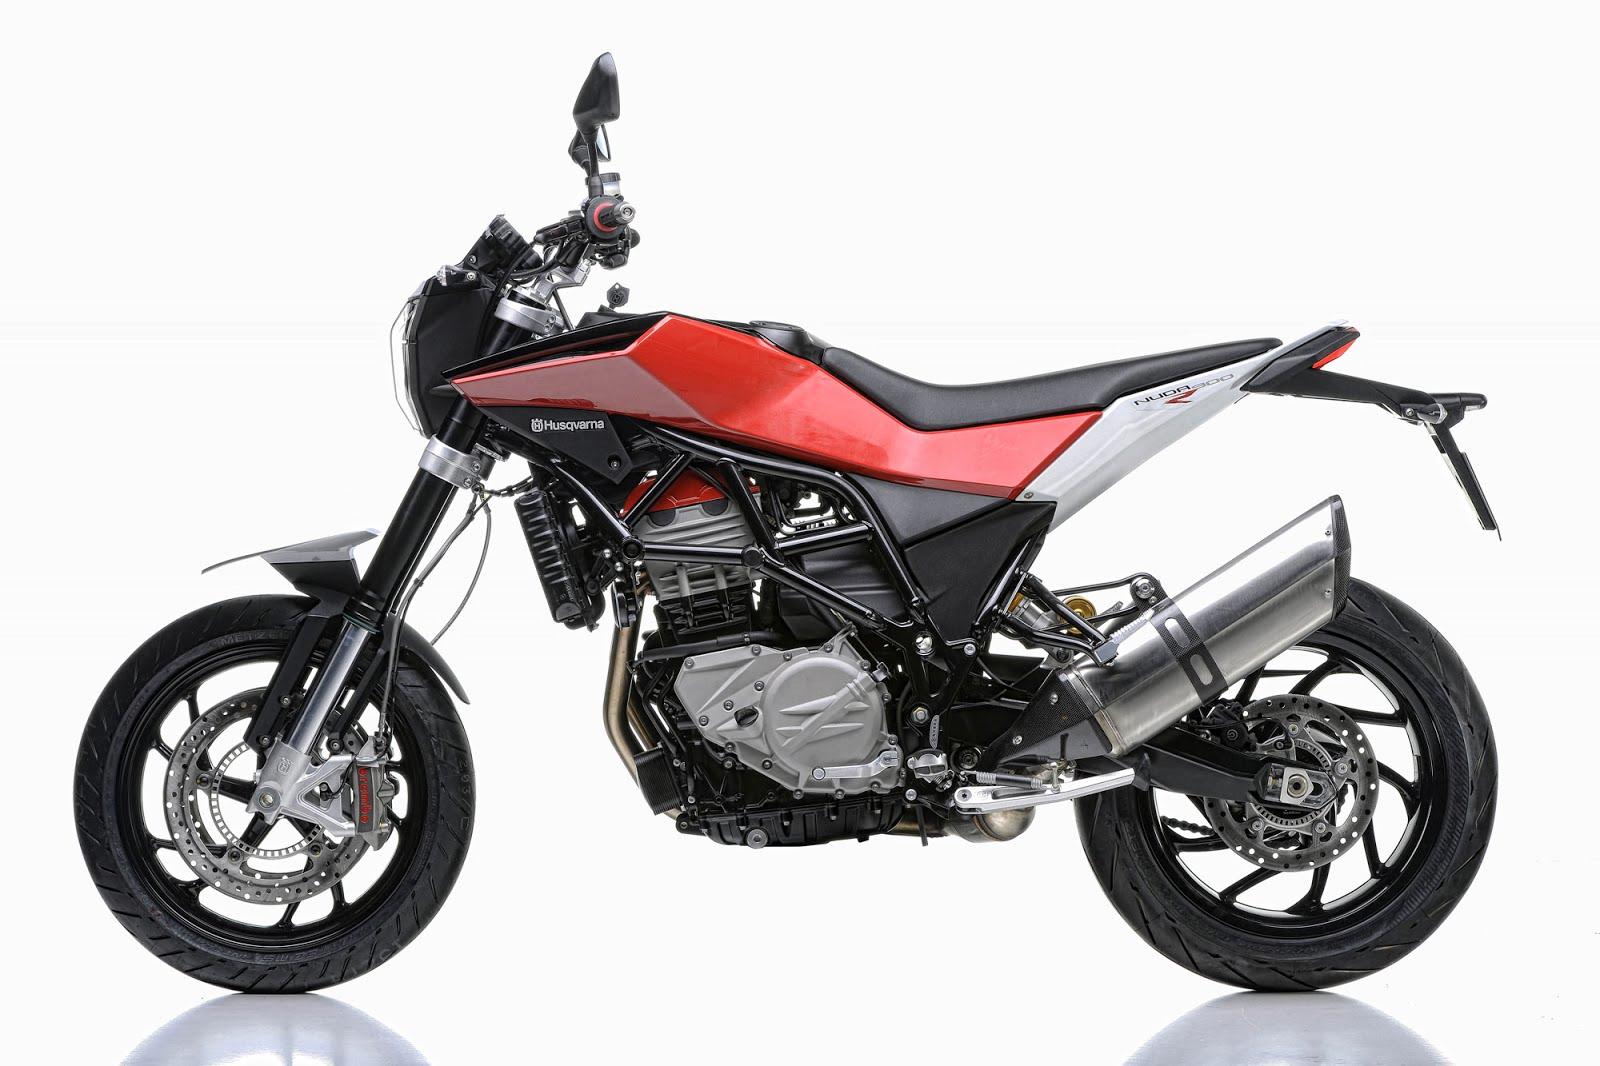 dd motorcycles husqvarna nuda r abs. Black Bedroom Furniture Sets. Home Design Ideas